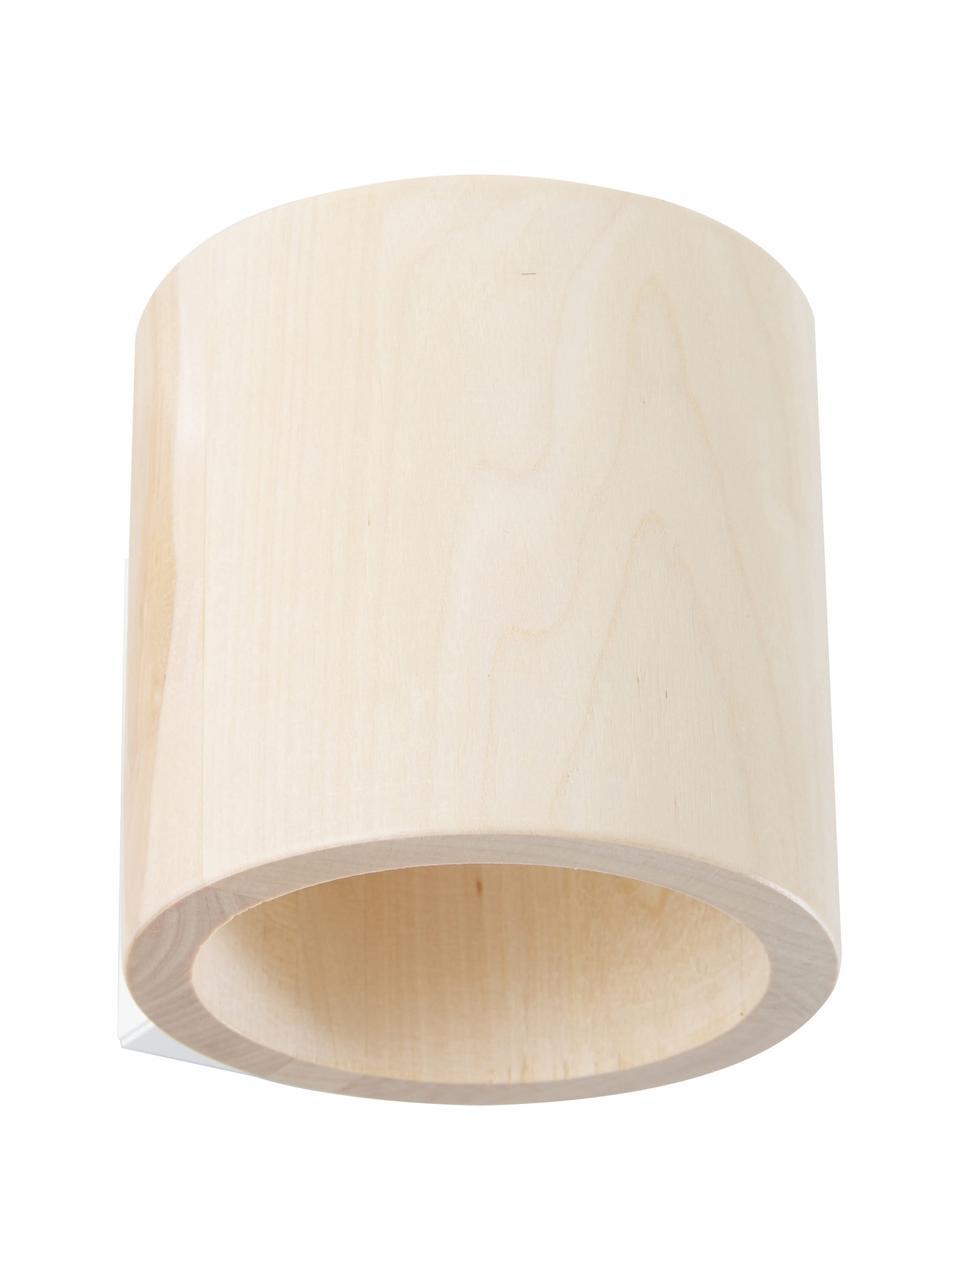 Wandlamp Roda van hout, Lampenkap: hout, Lichtbruin, 10 x 10 cm